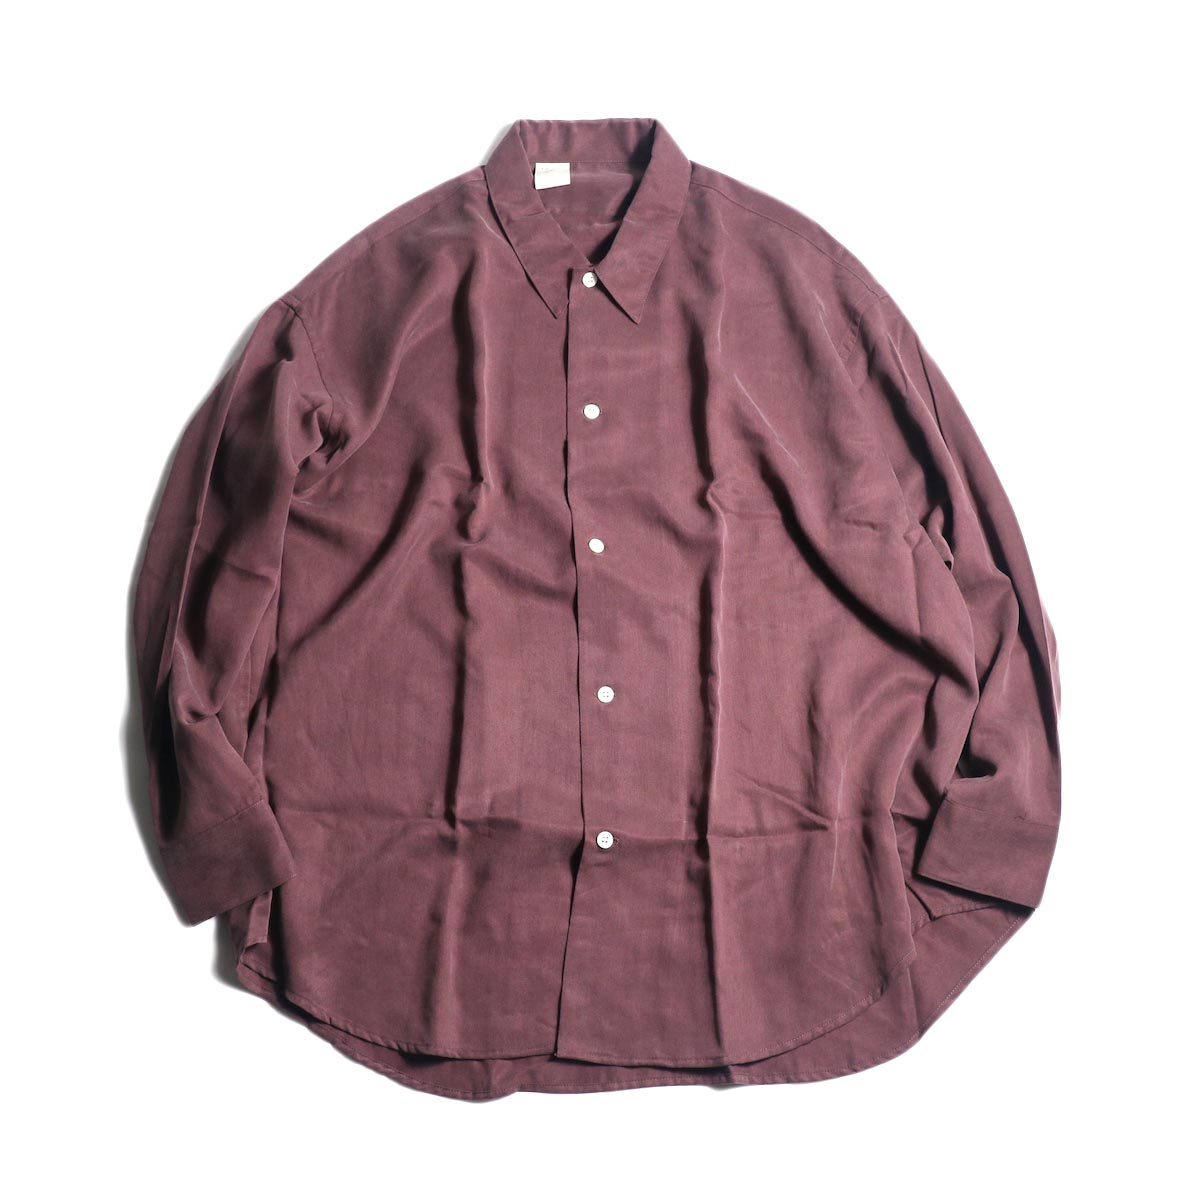 N.HOOLYWOOD / 1202-SH07-037 Loose Shirt (Burgundy)